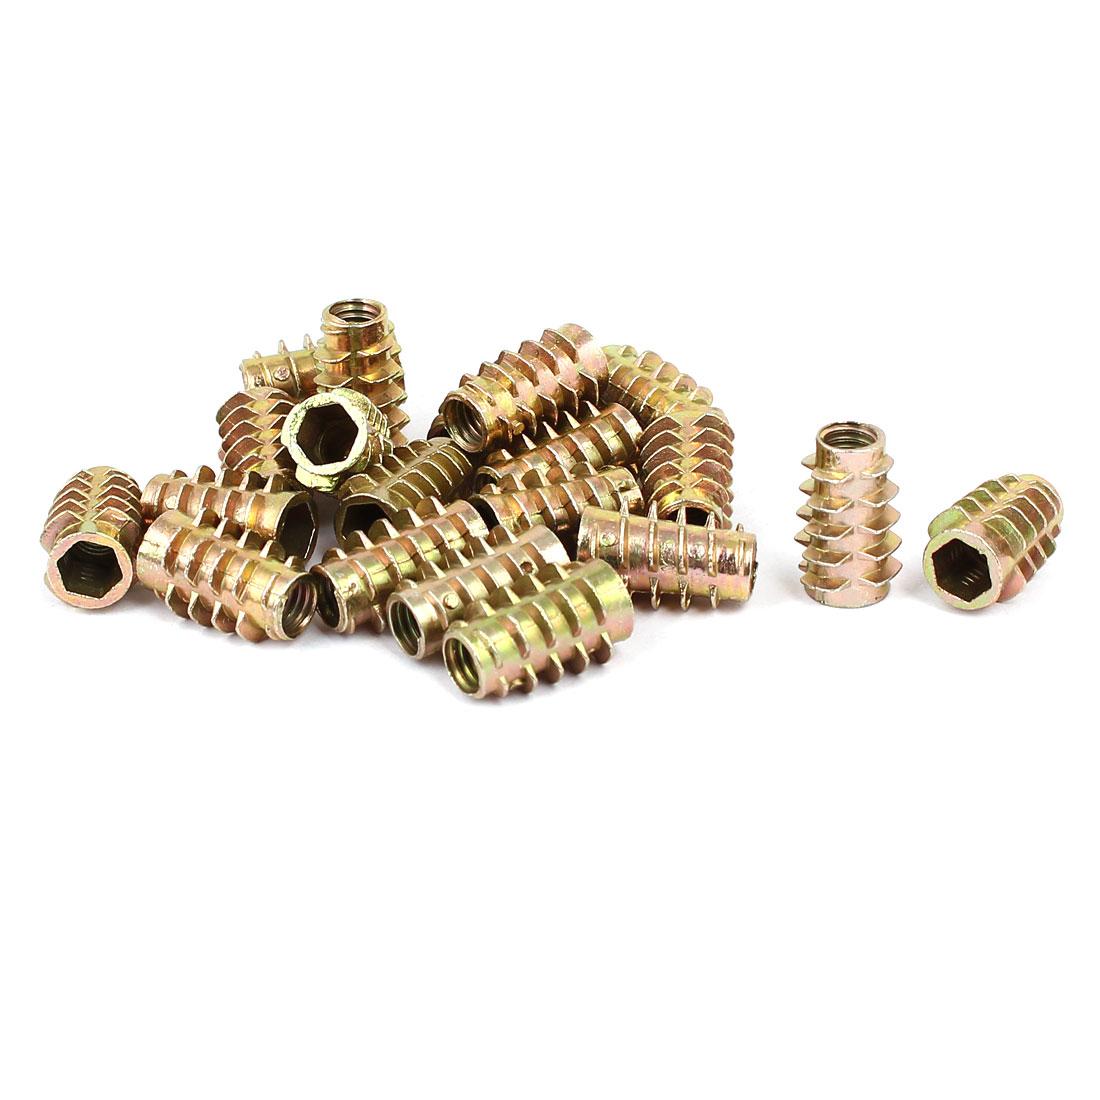 Wood Furniture Zinc Alloy Hex Socket Insert Screws E-Nuts M6x18mm 20pcs